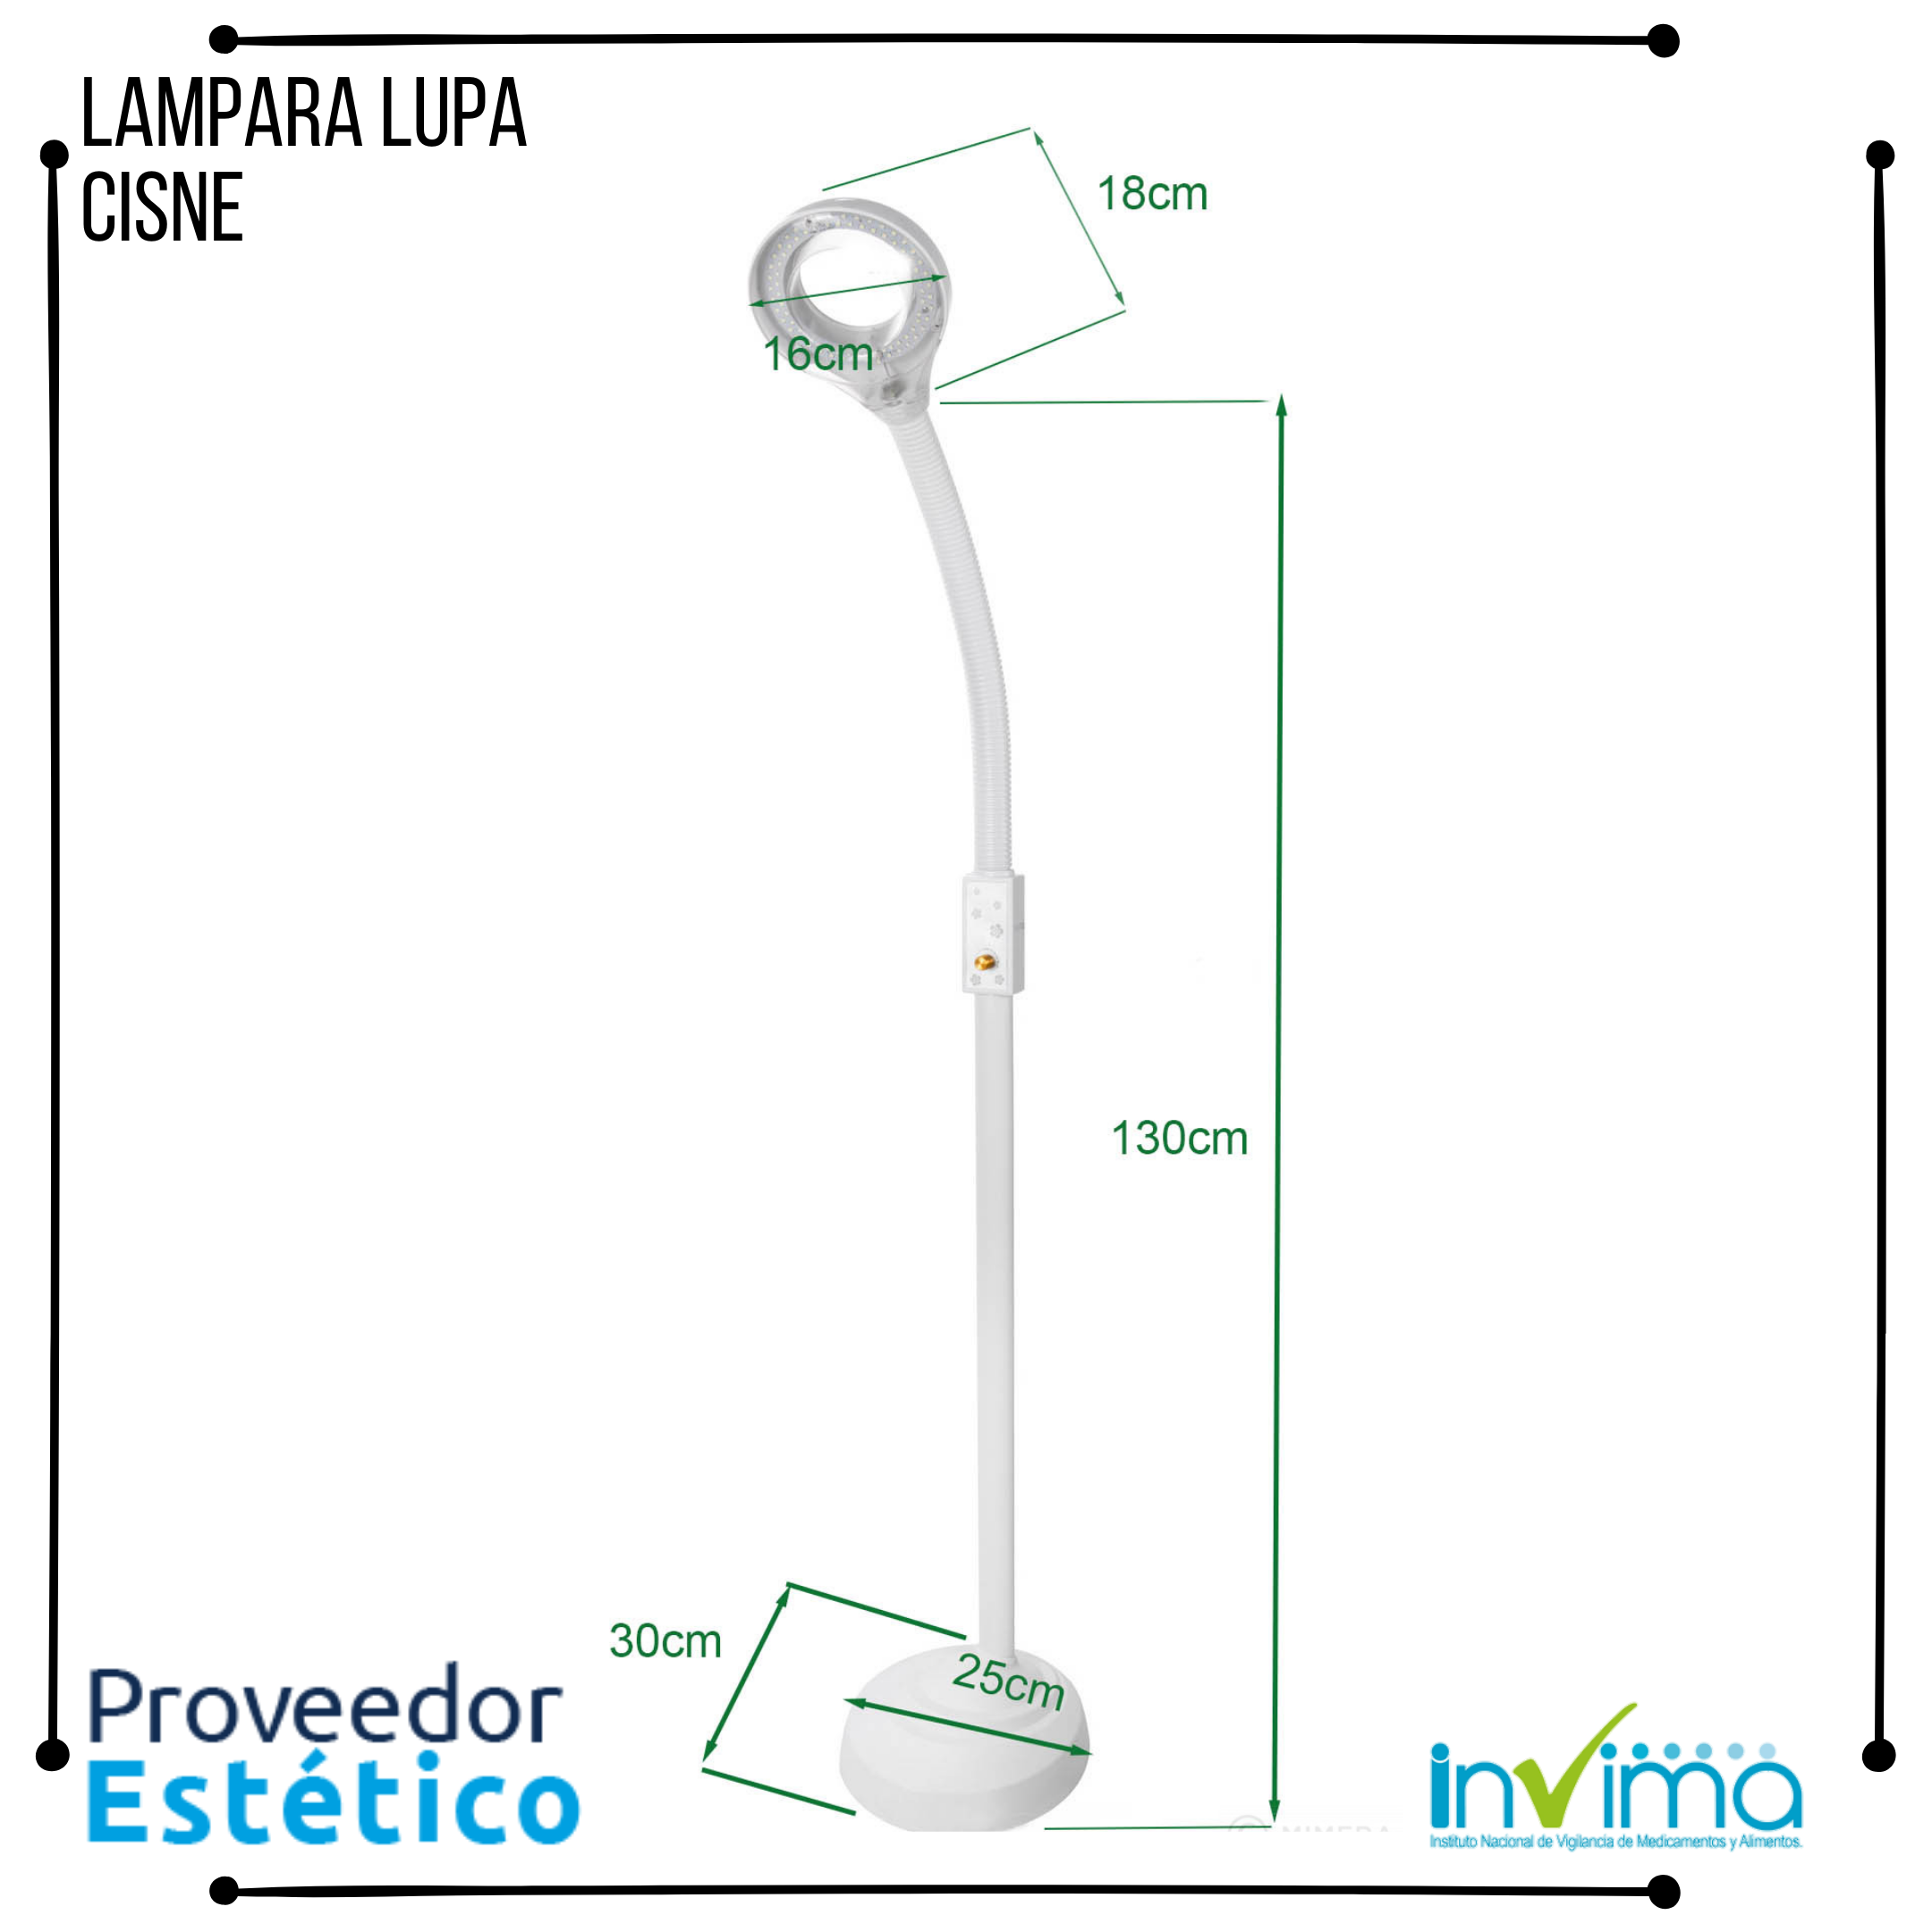 https://0201.nccdn.net/4_2/000/000/056/7dc/lampara-lupa-led-cisne--4-.png